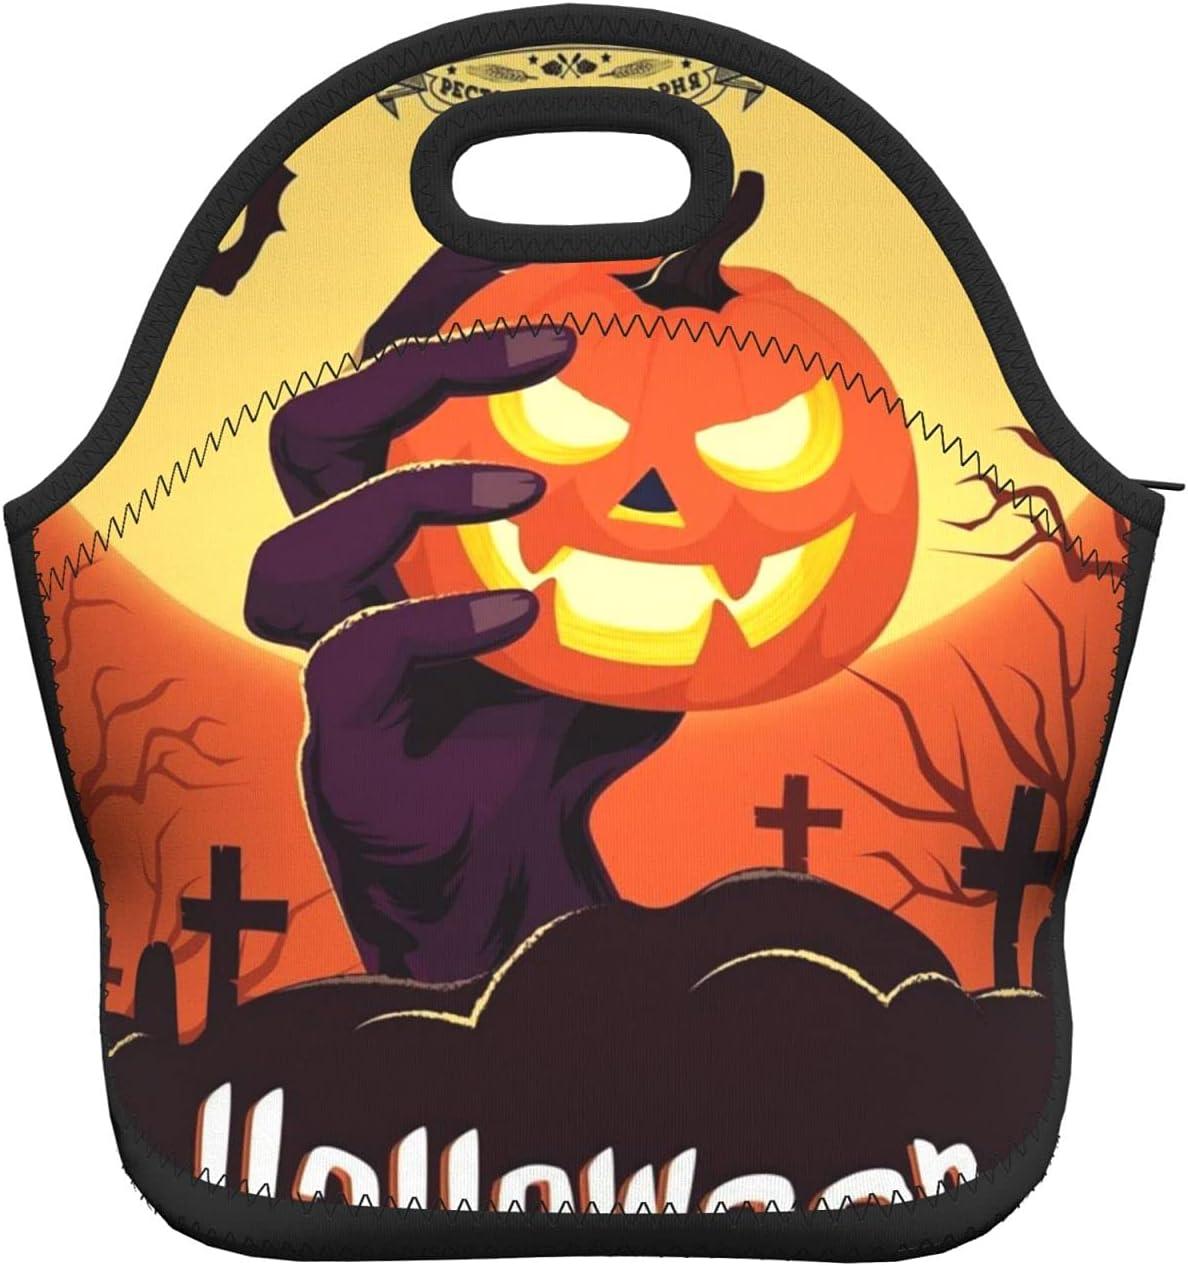 Halloween price Holding Pumpkin In Lunch Neoprene Soft Hand Spring new work